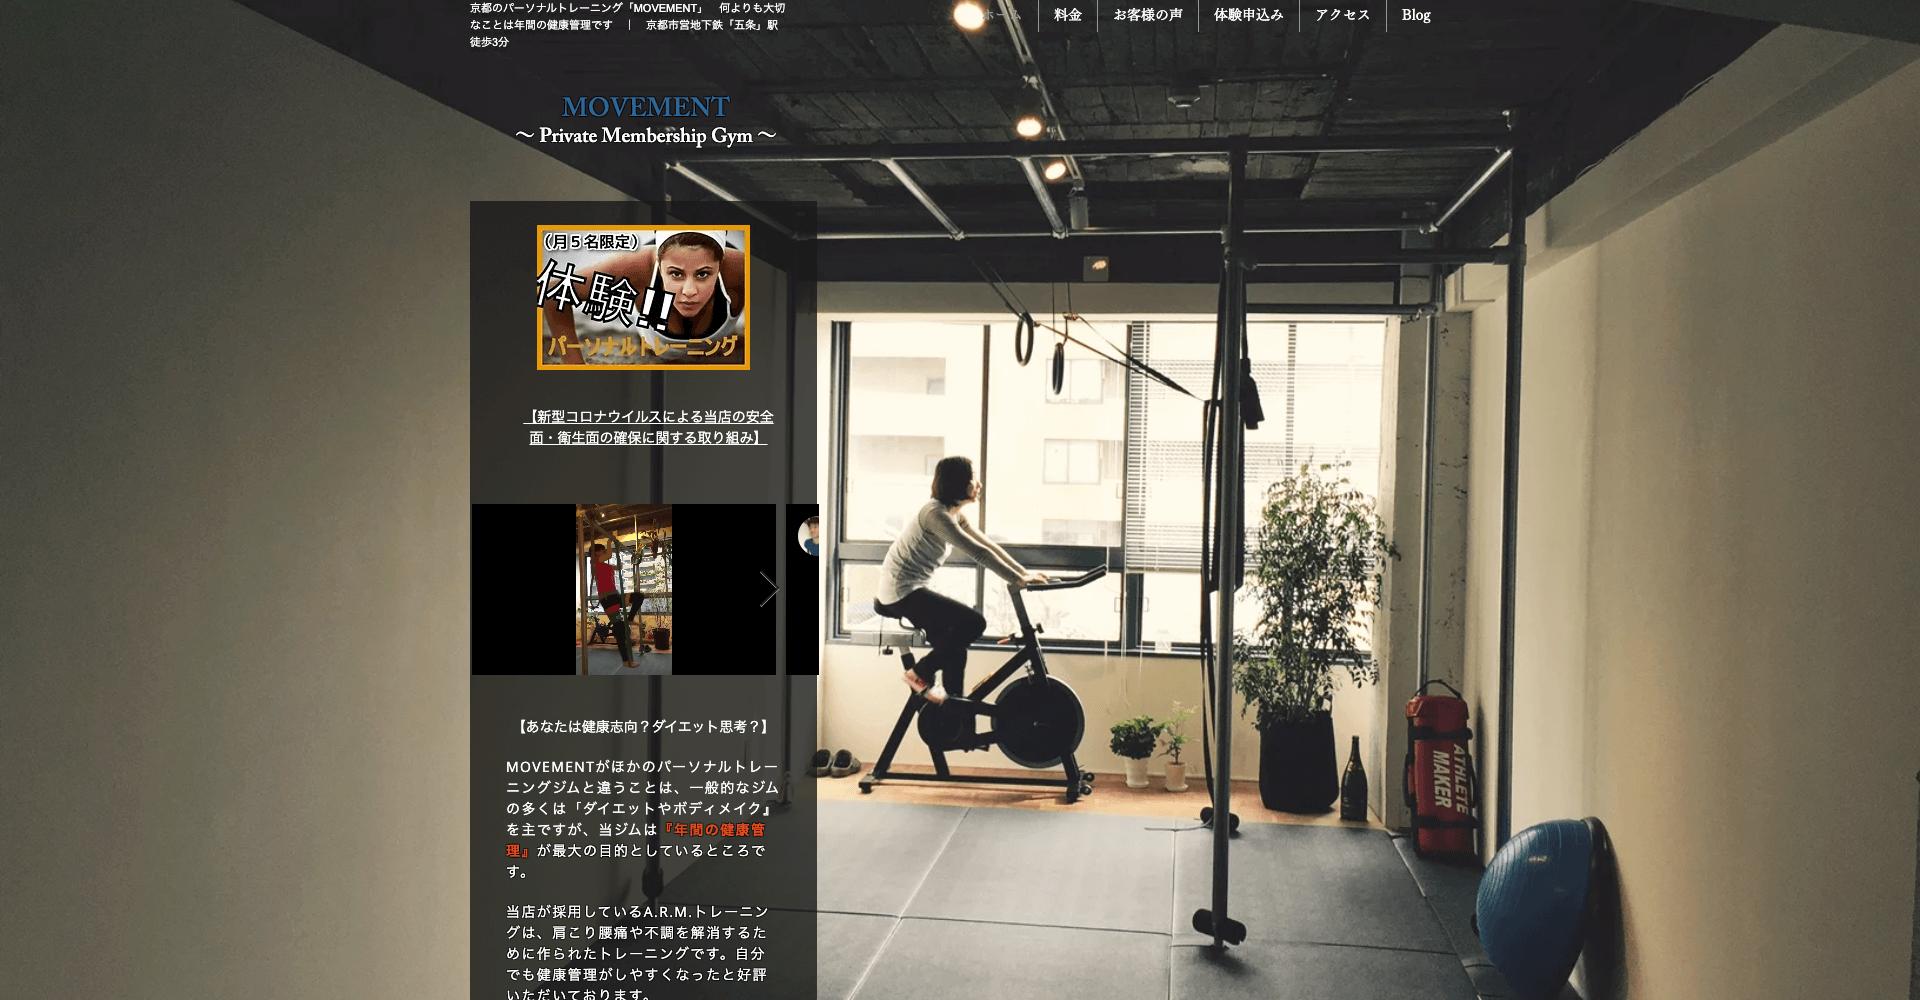 MOVEMENT(ムーブメント)~Private Membership Gym~